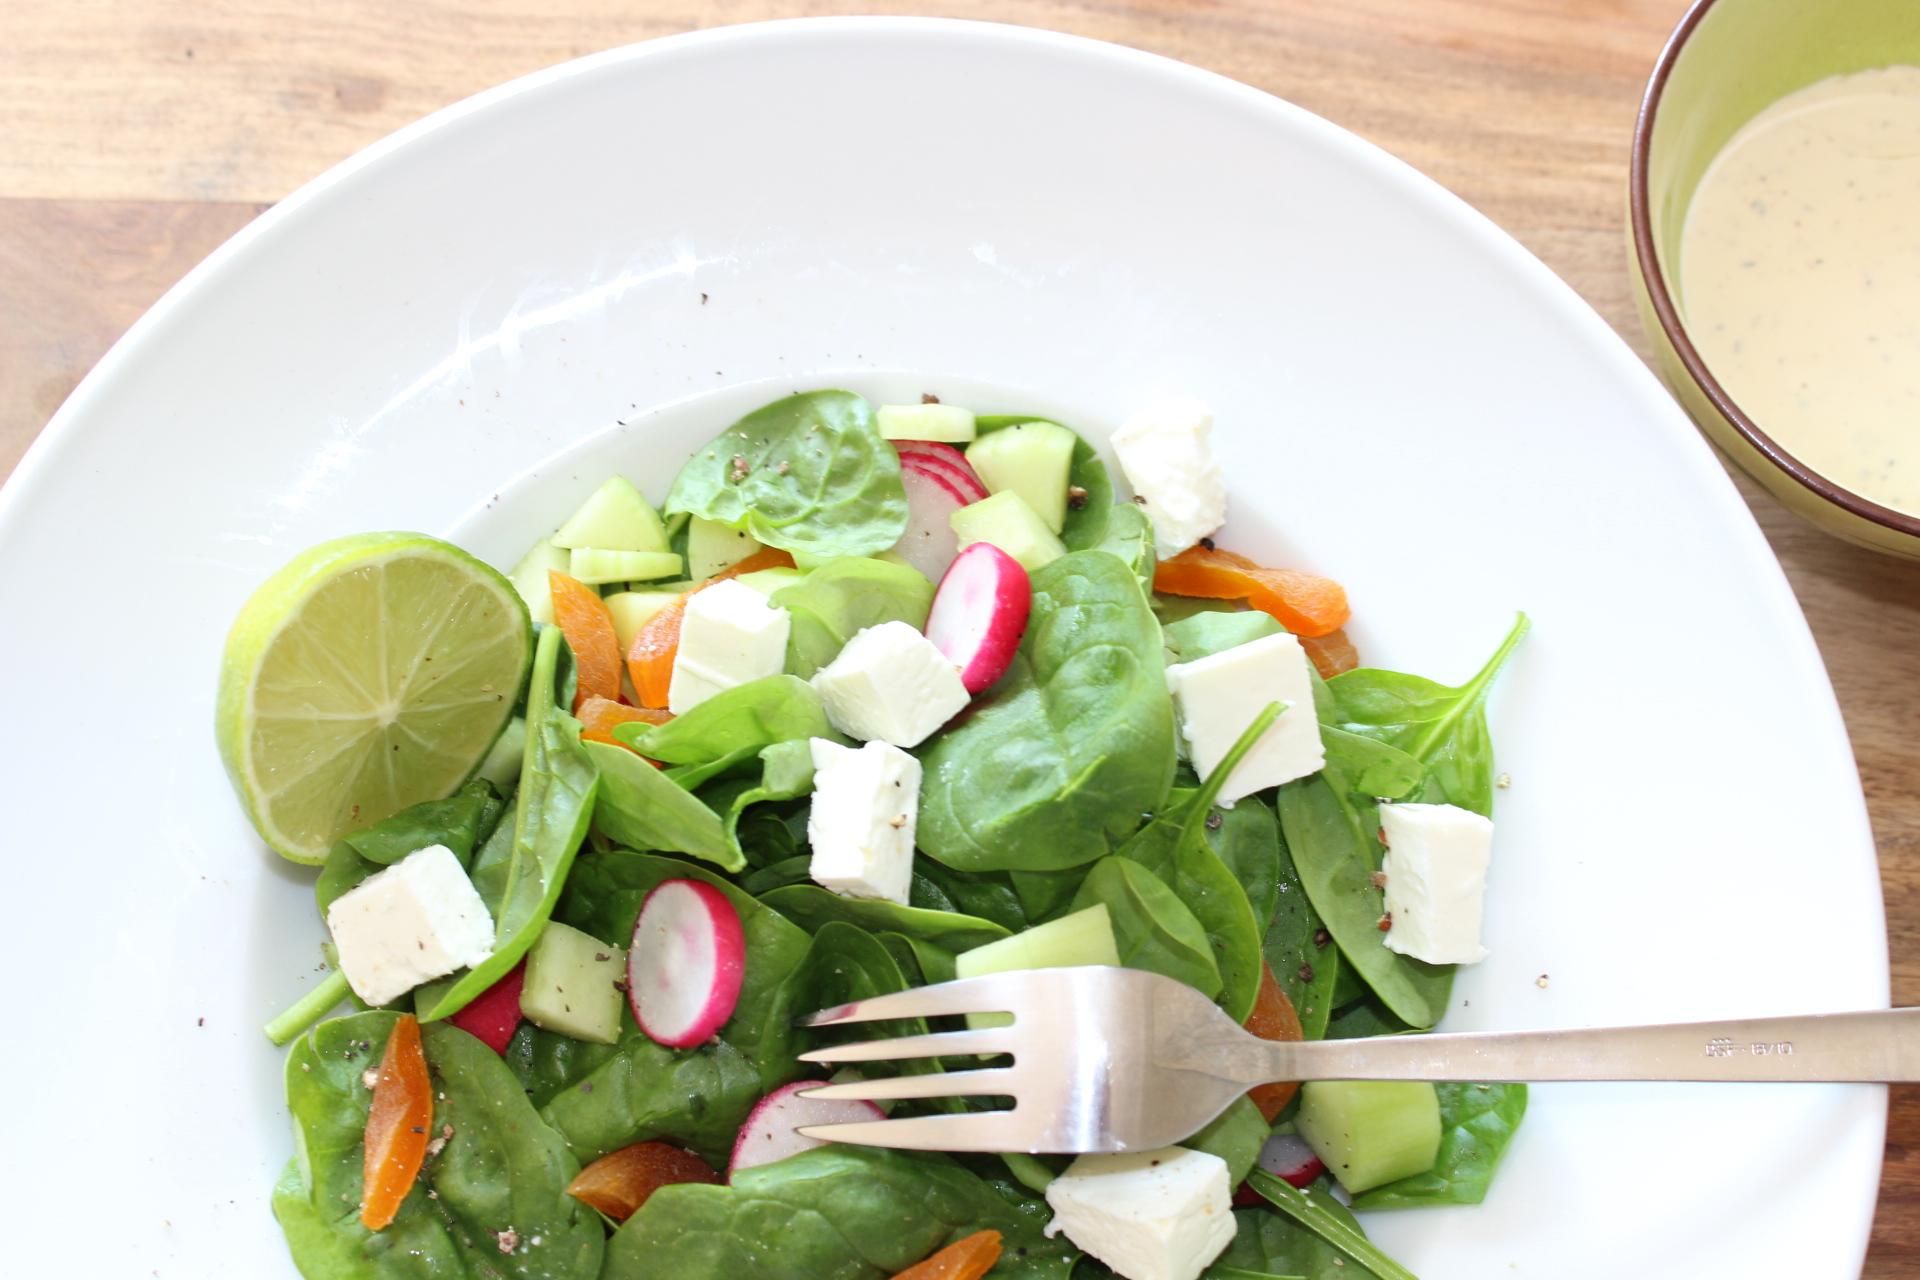 Babyspinat-Salat-Feta-Aprikosen-Radieschen